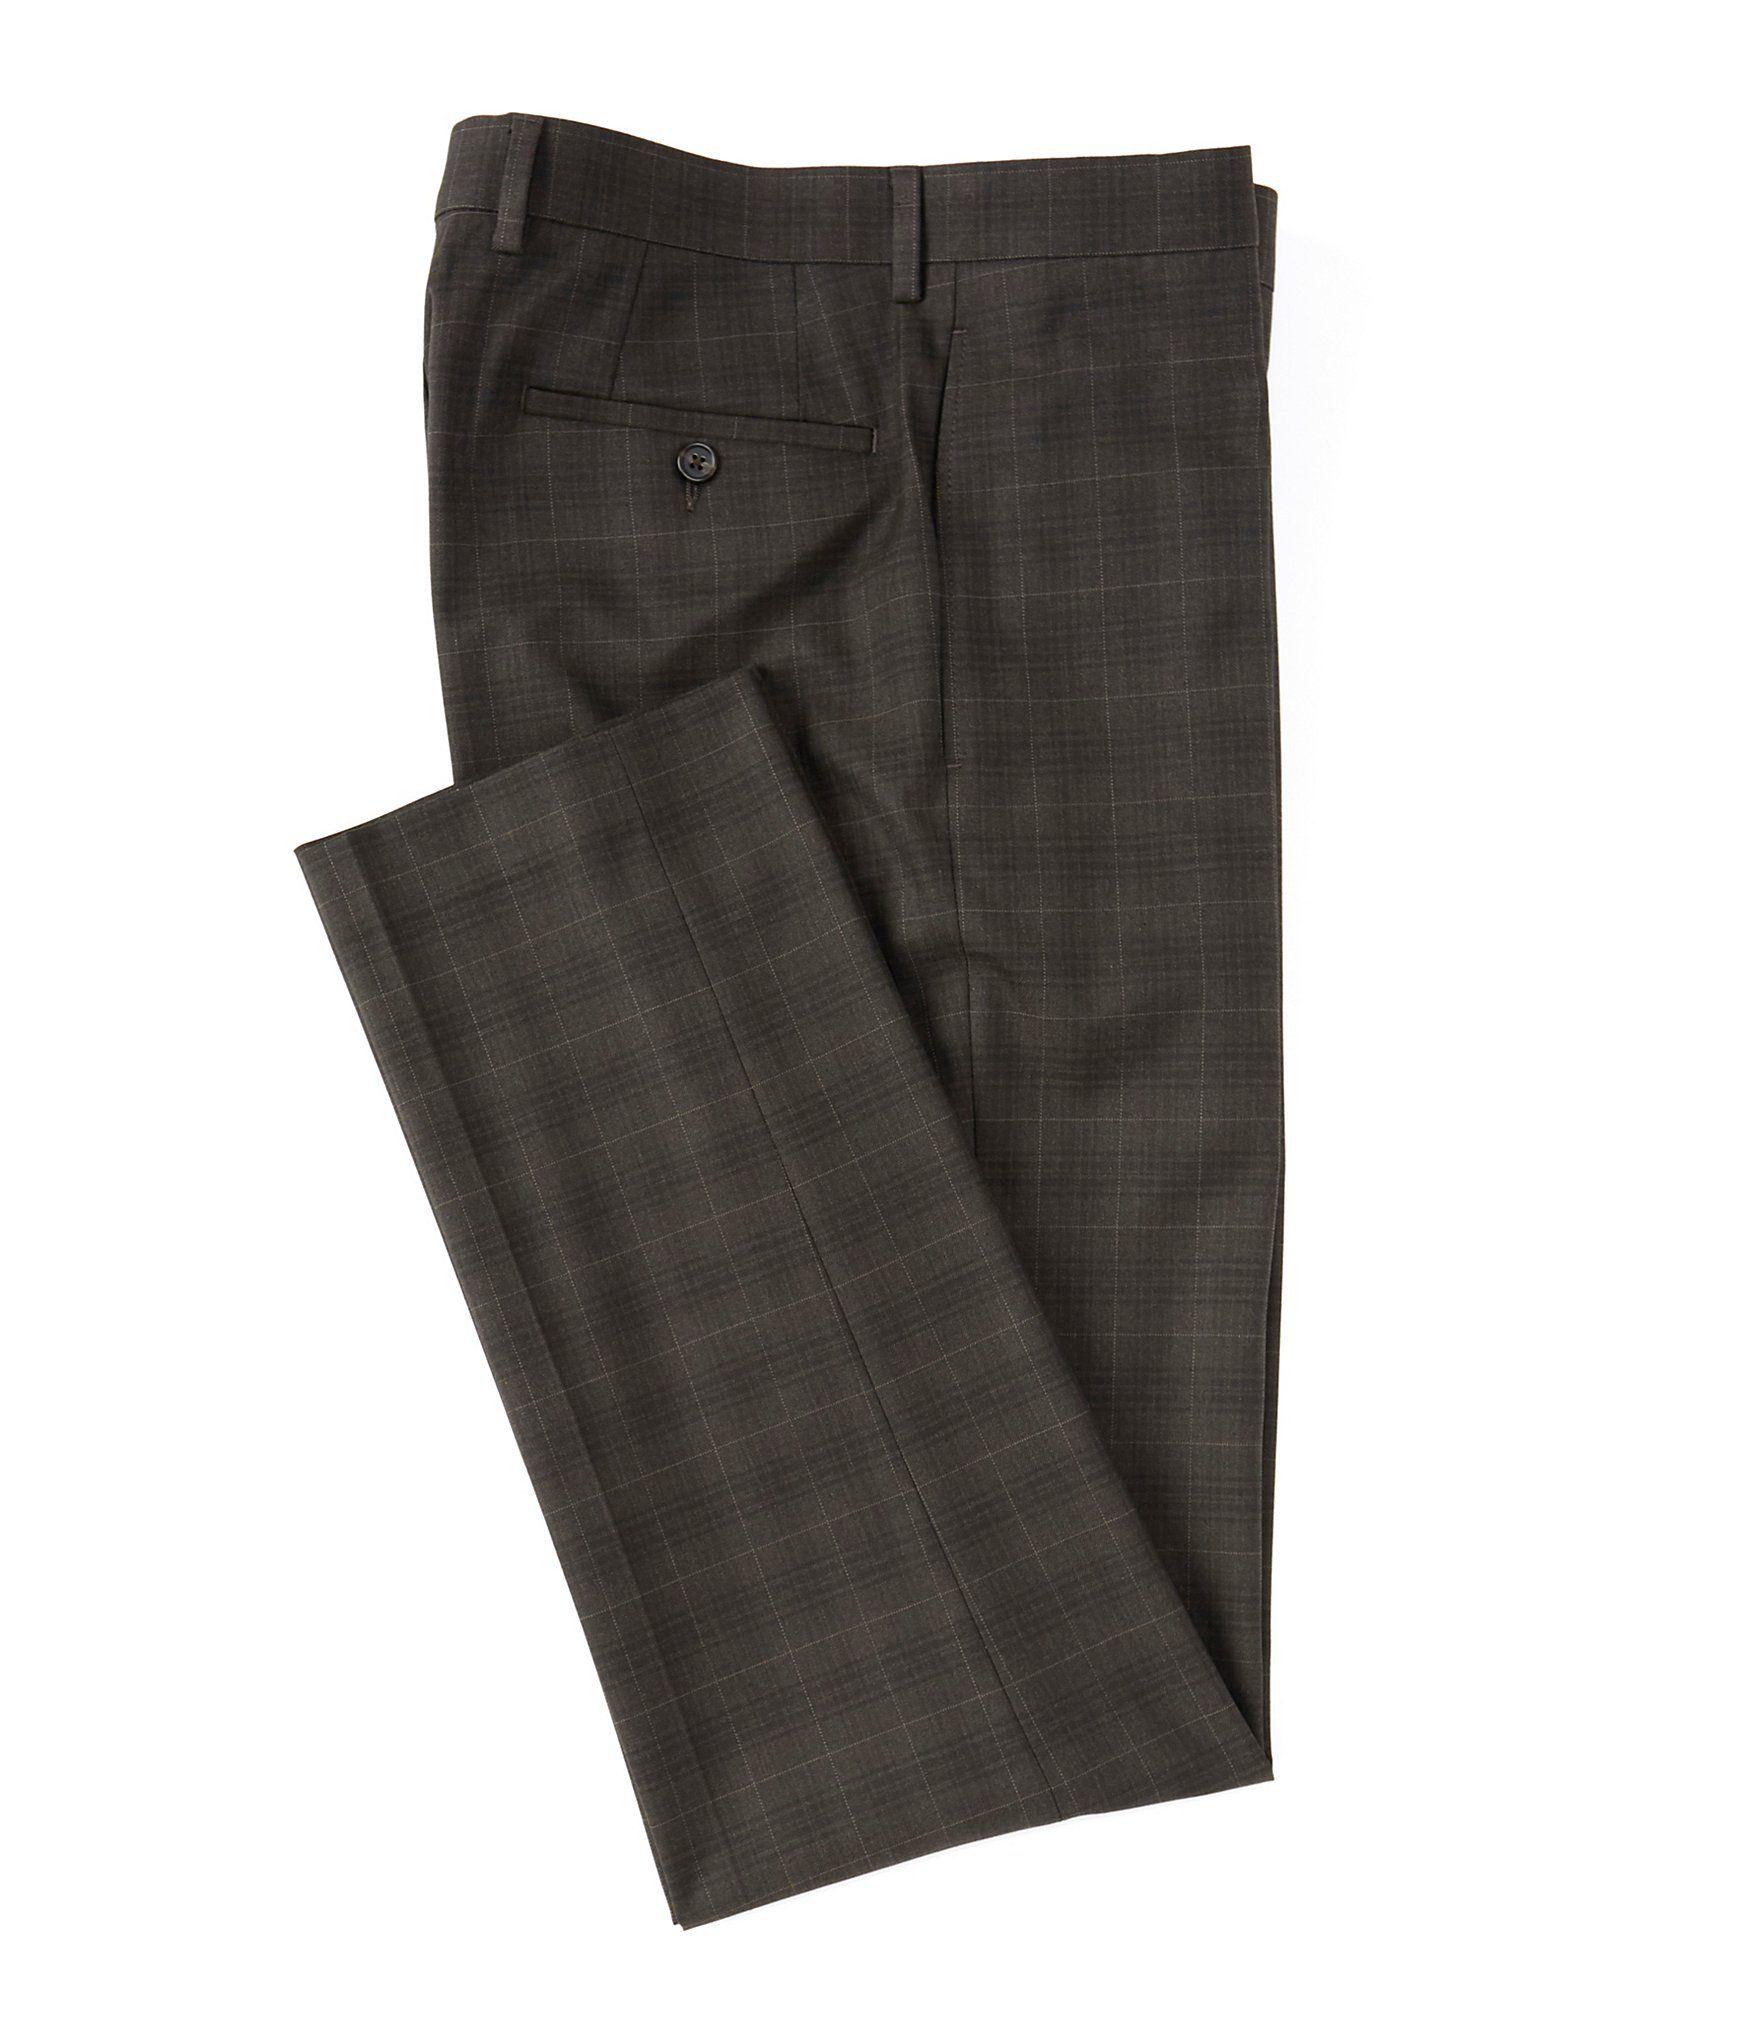 Ralph Ralph Lauren Slim Fit Flat Front Dress Pants